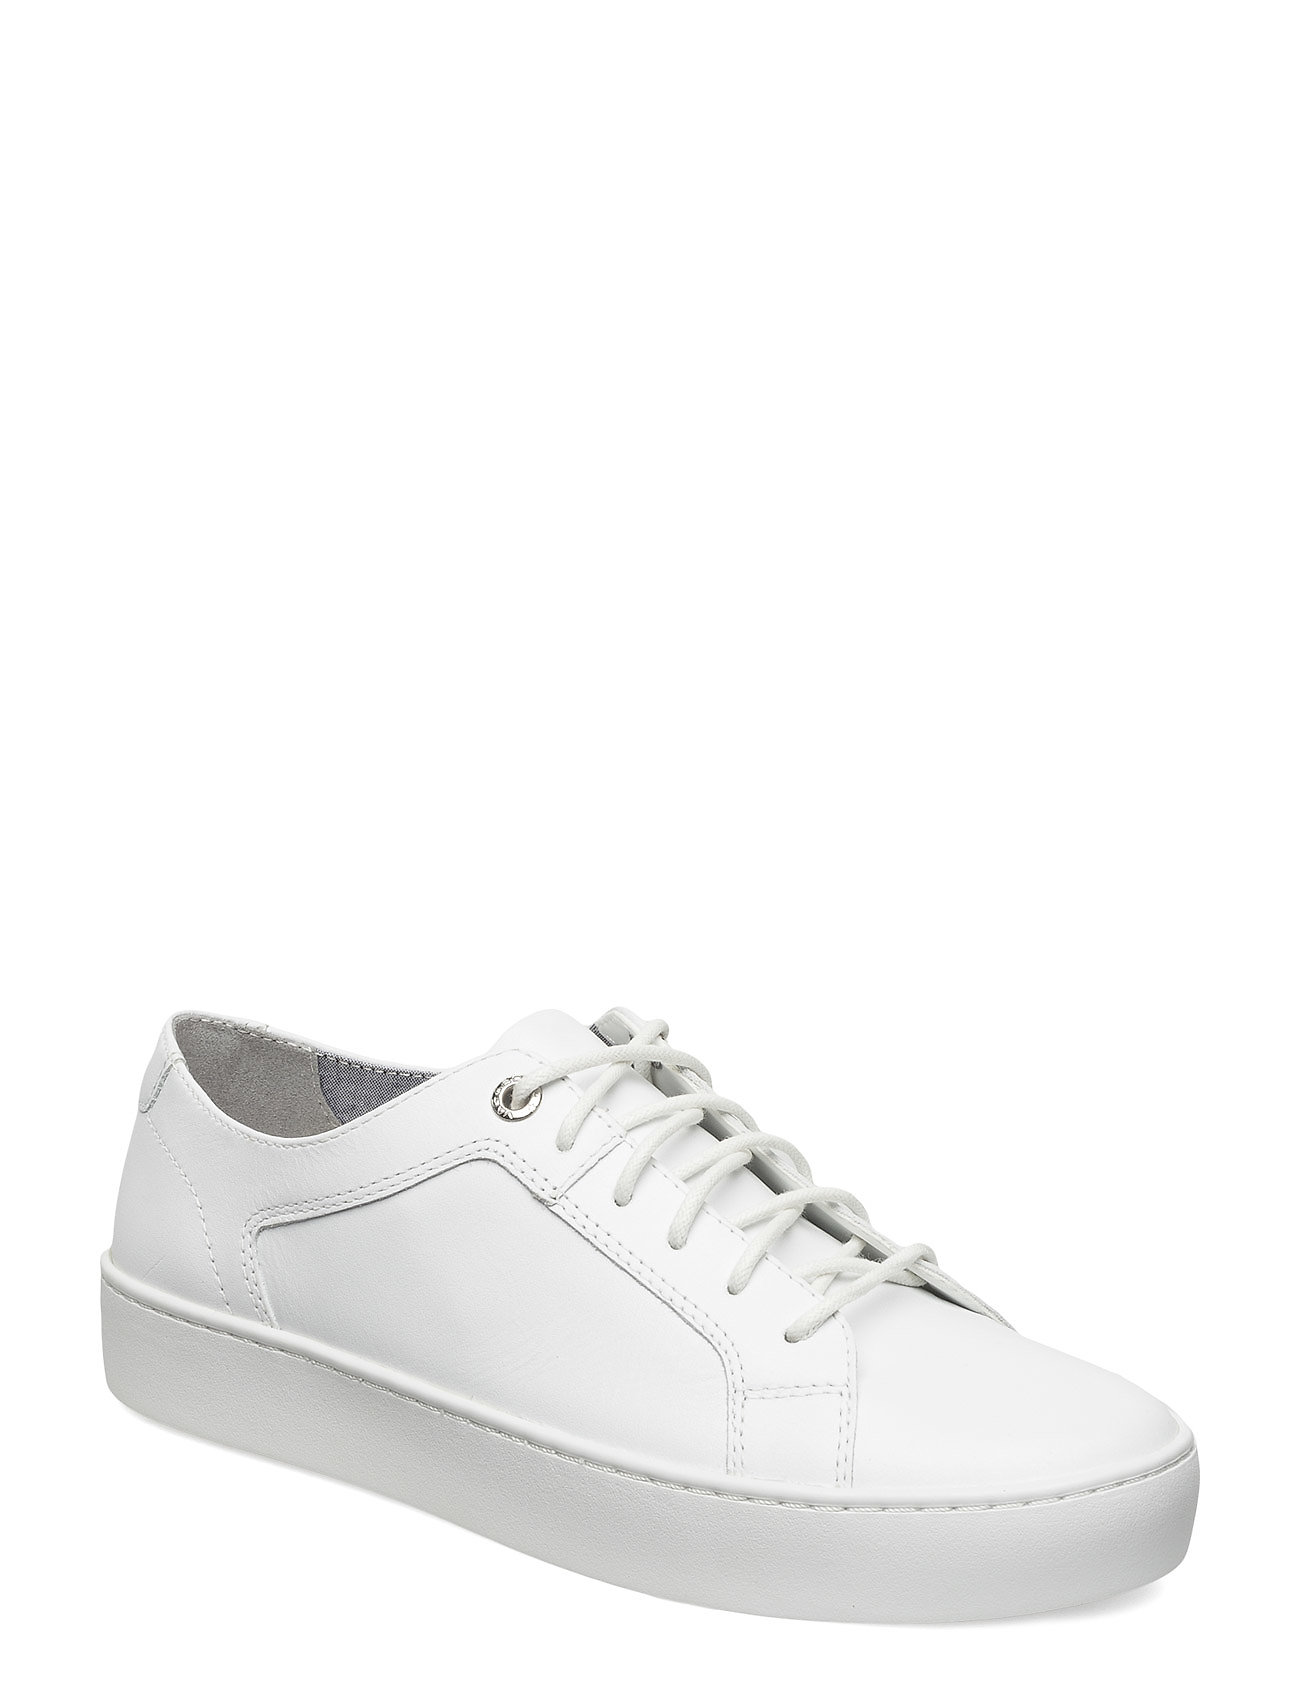 Zoe VAGABOND Sneakers til Damer i hvid